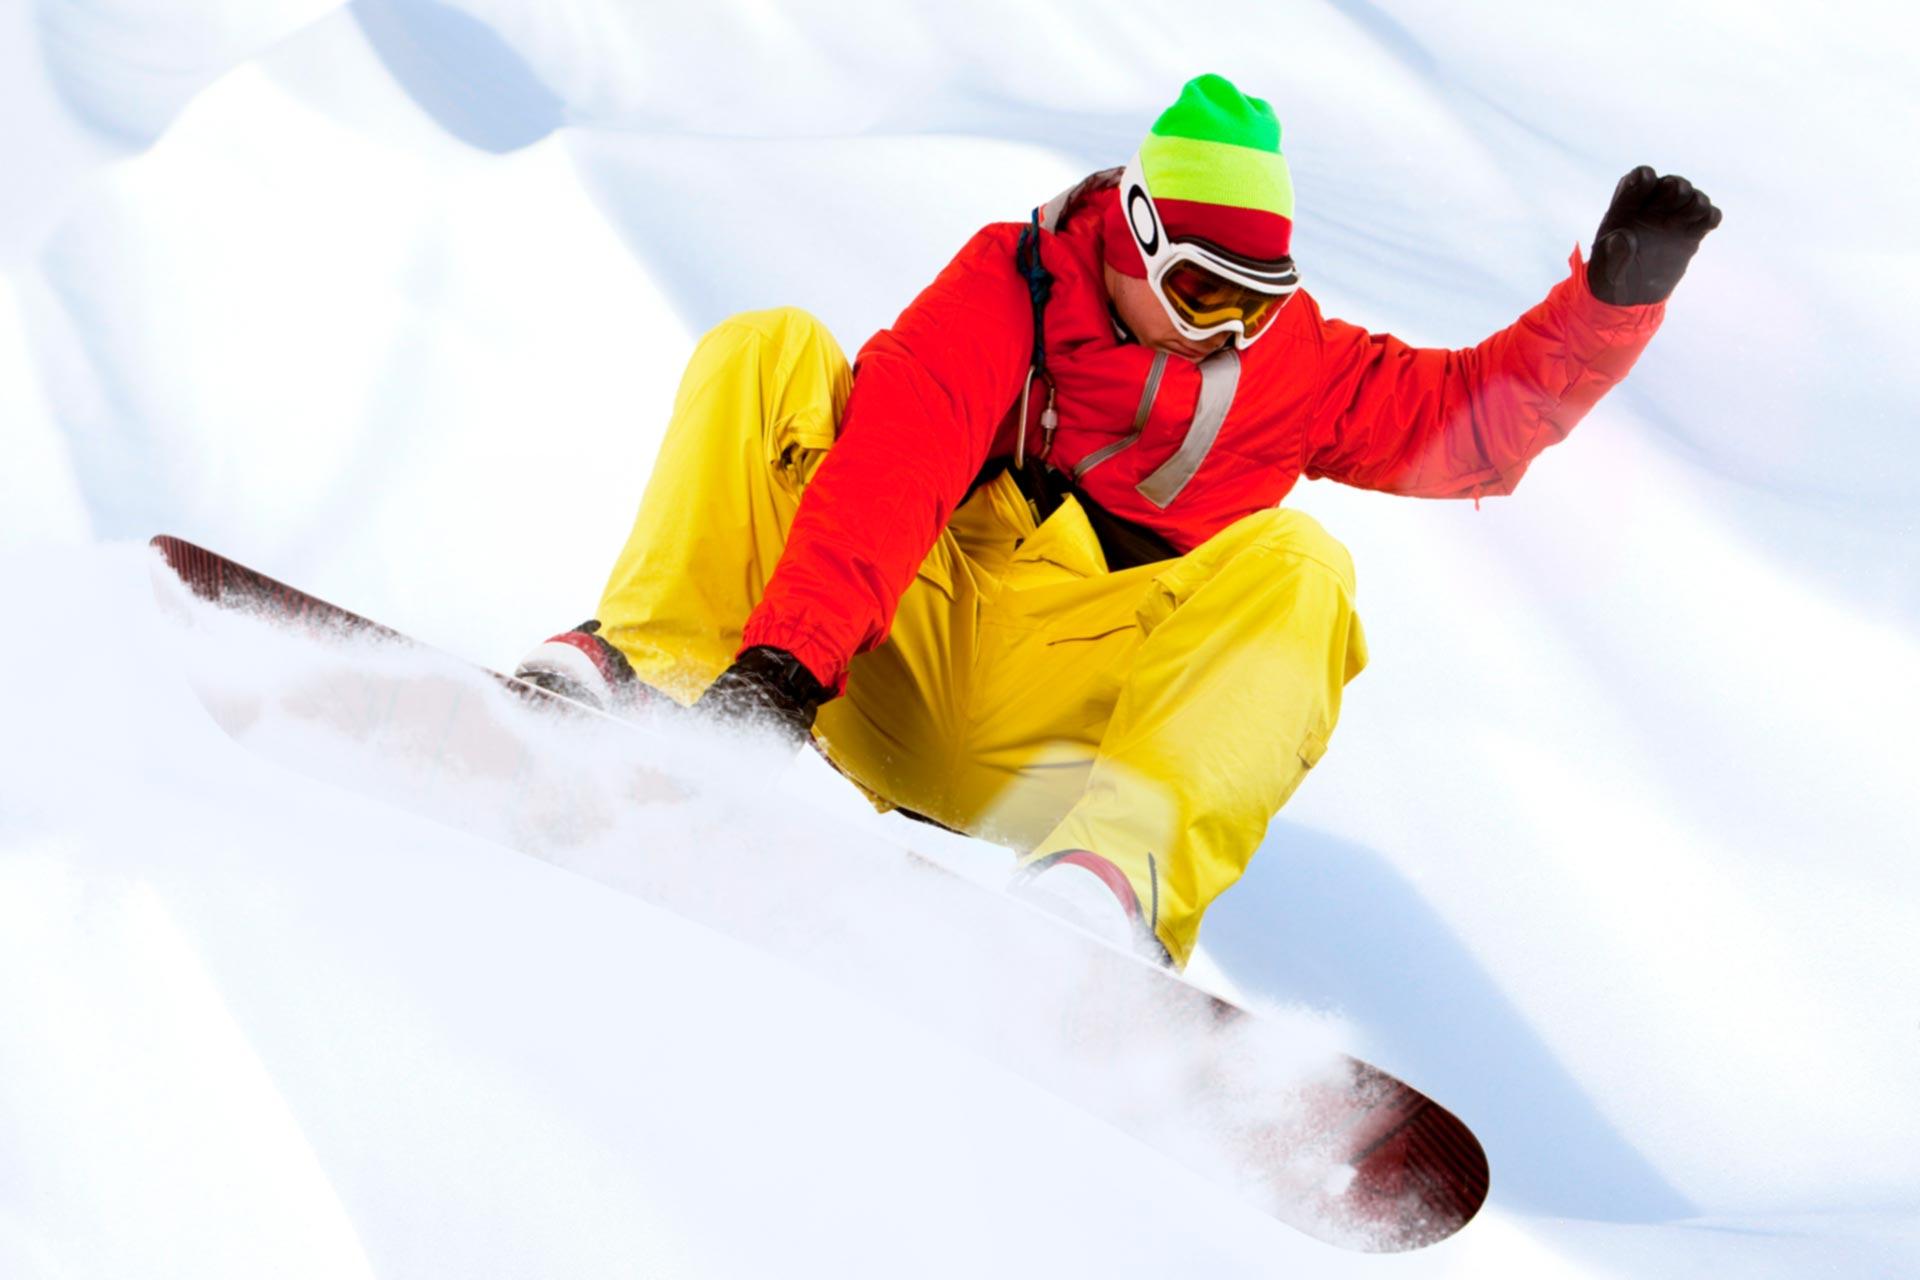 TD2 Snowboard